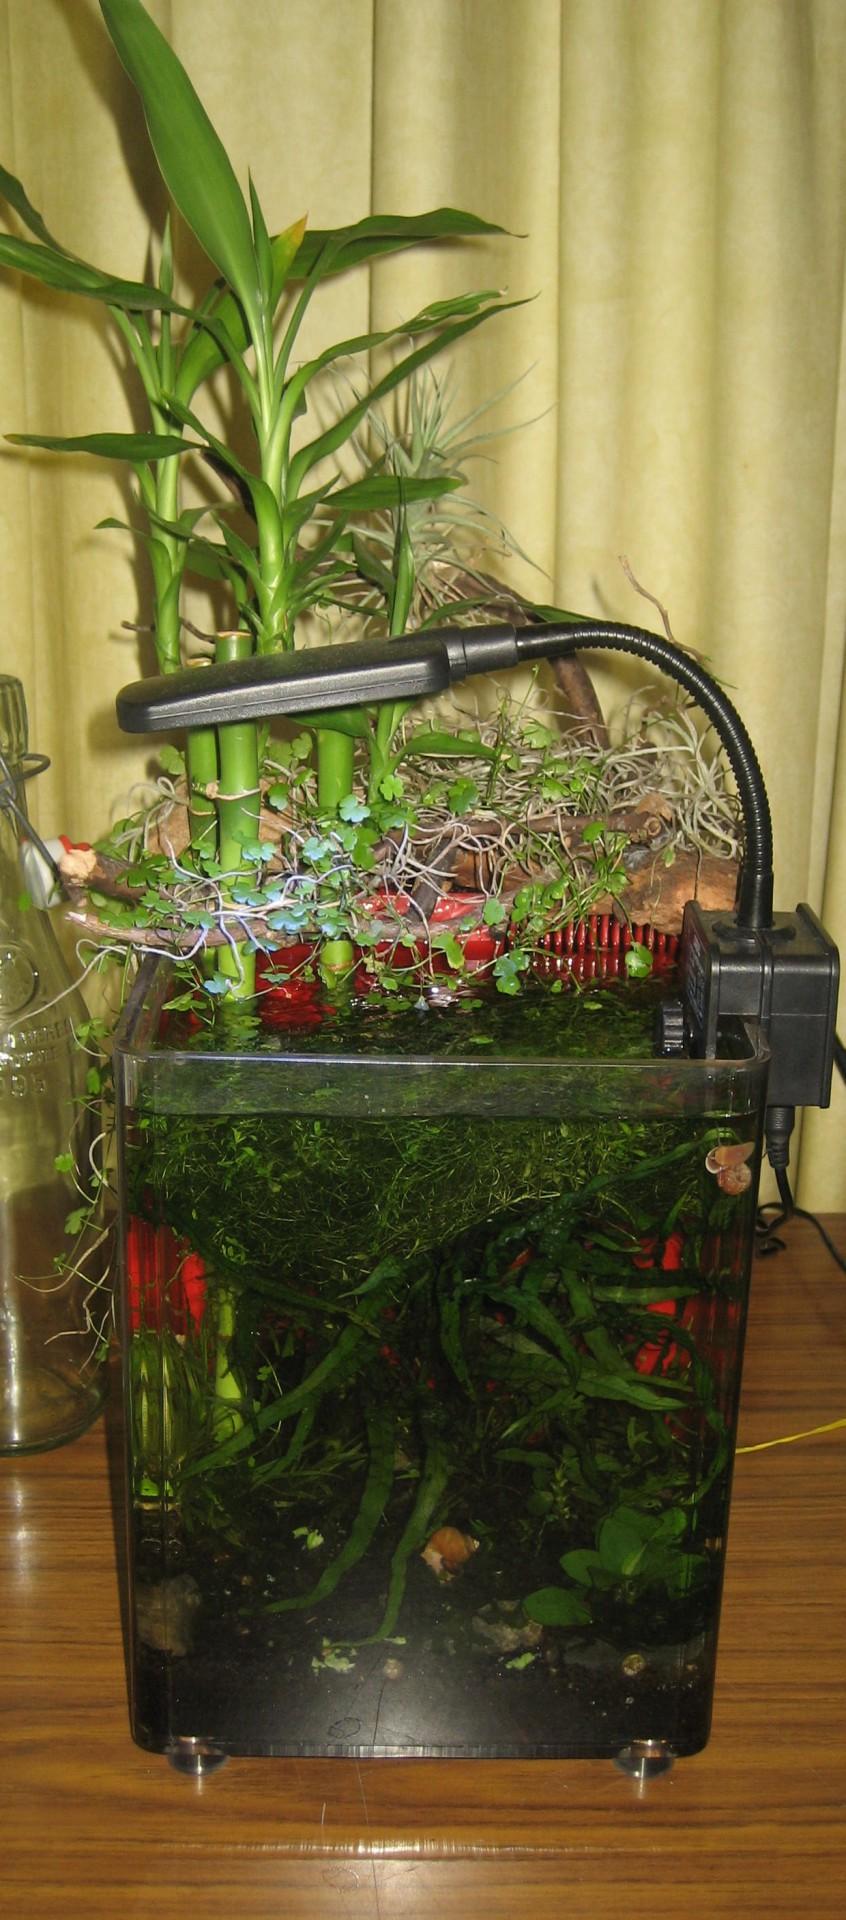 Zen snail riparium (full view)